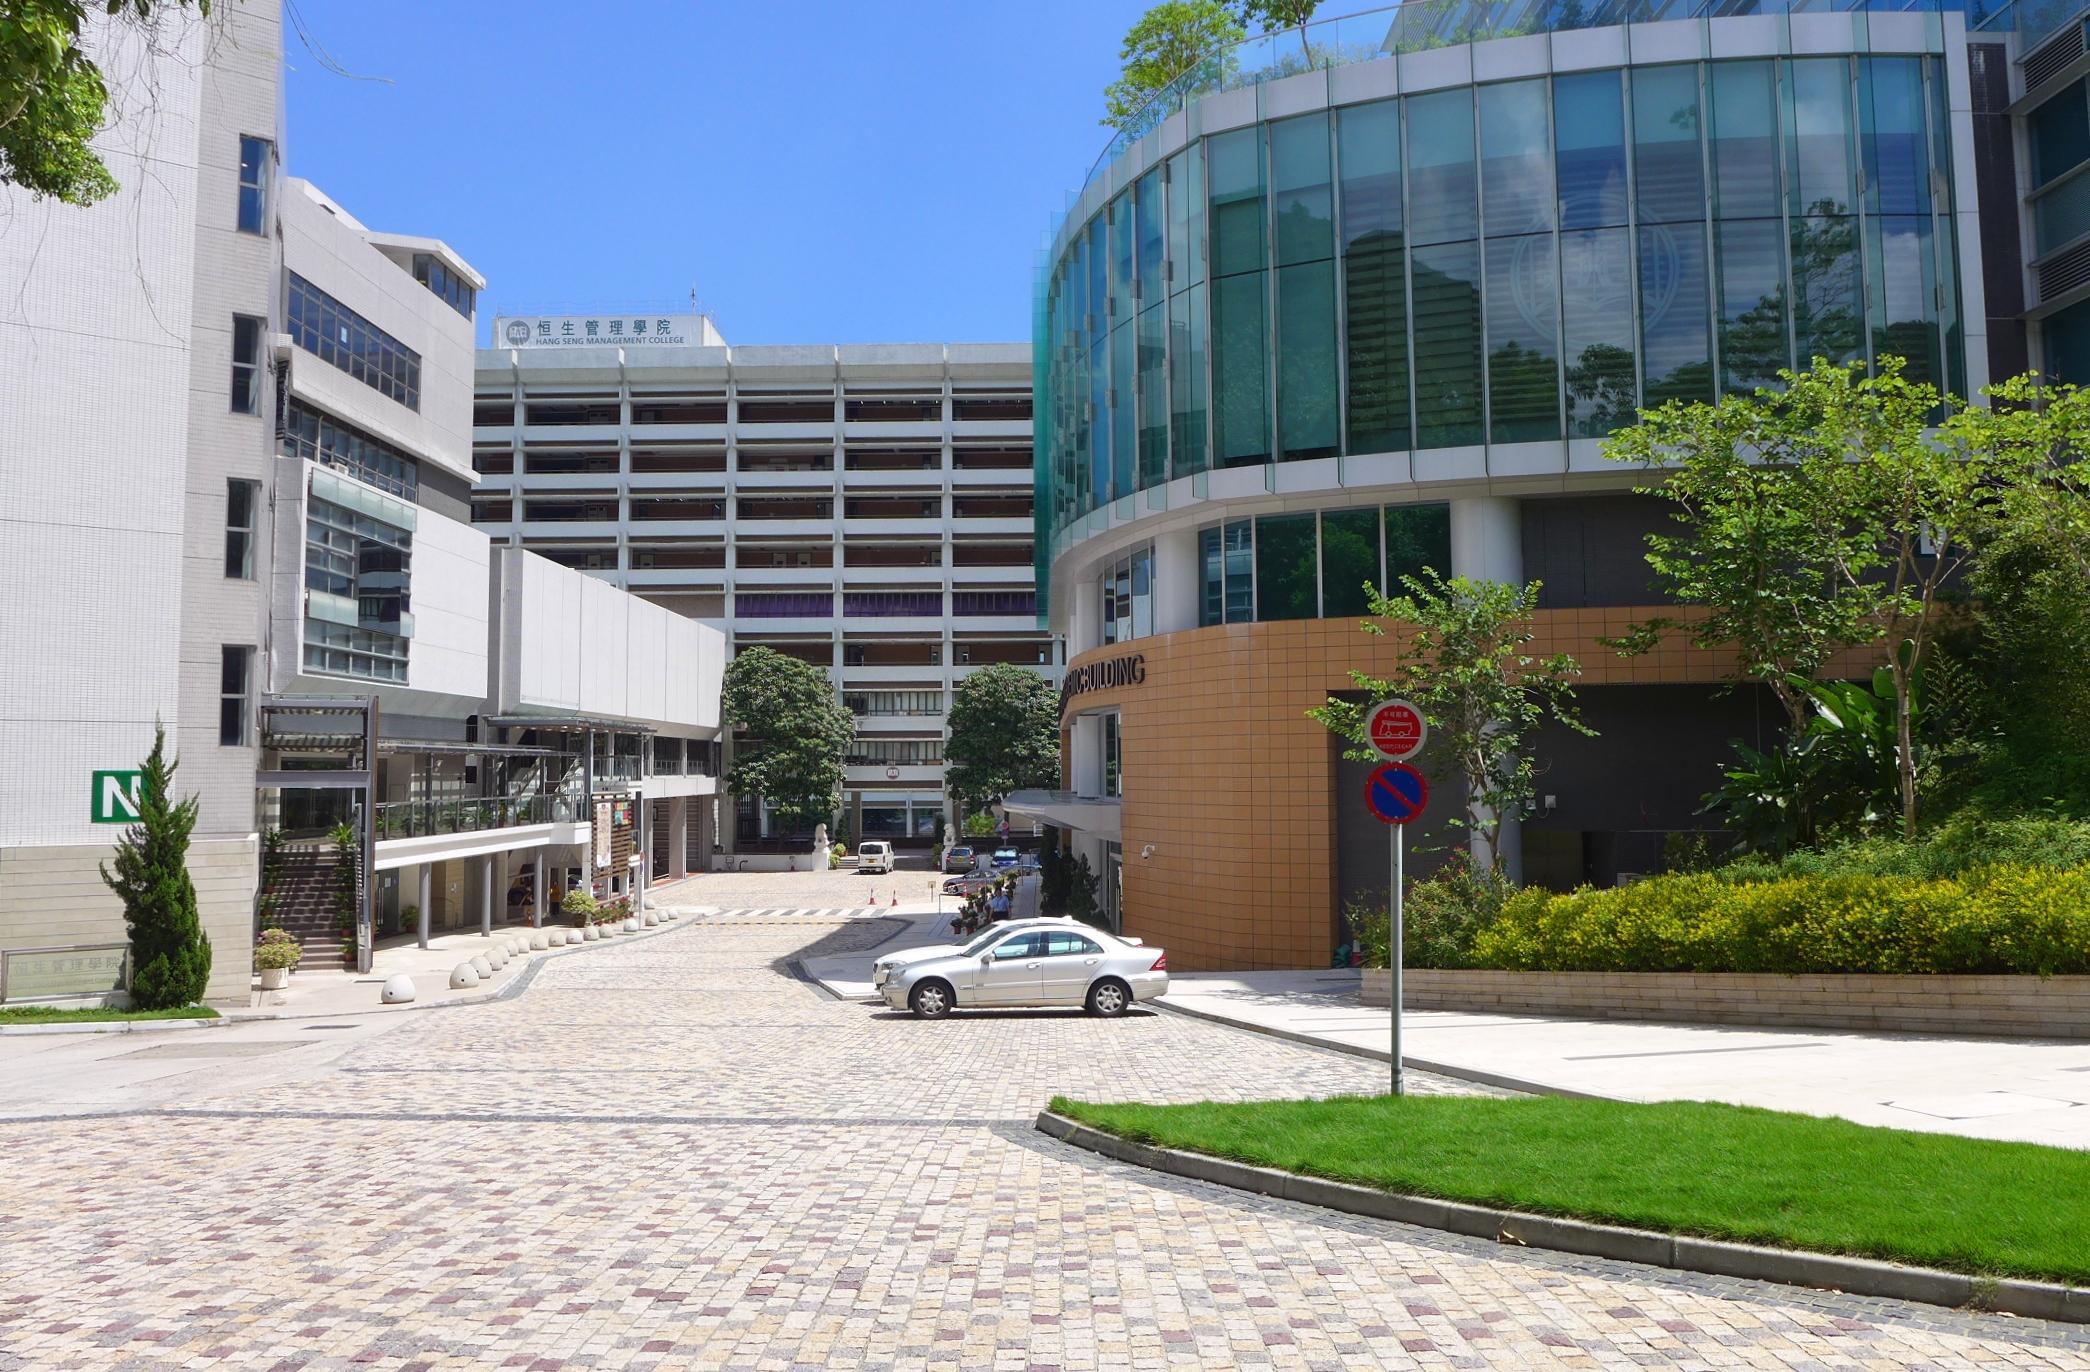 File:Hang Seng Management College View1 201508.jpg - 維基百科。自由的百科全書